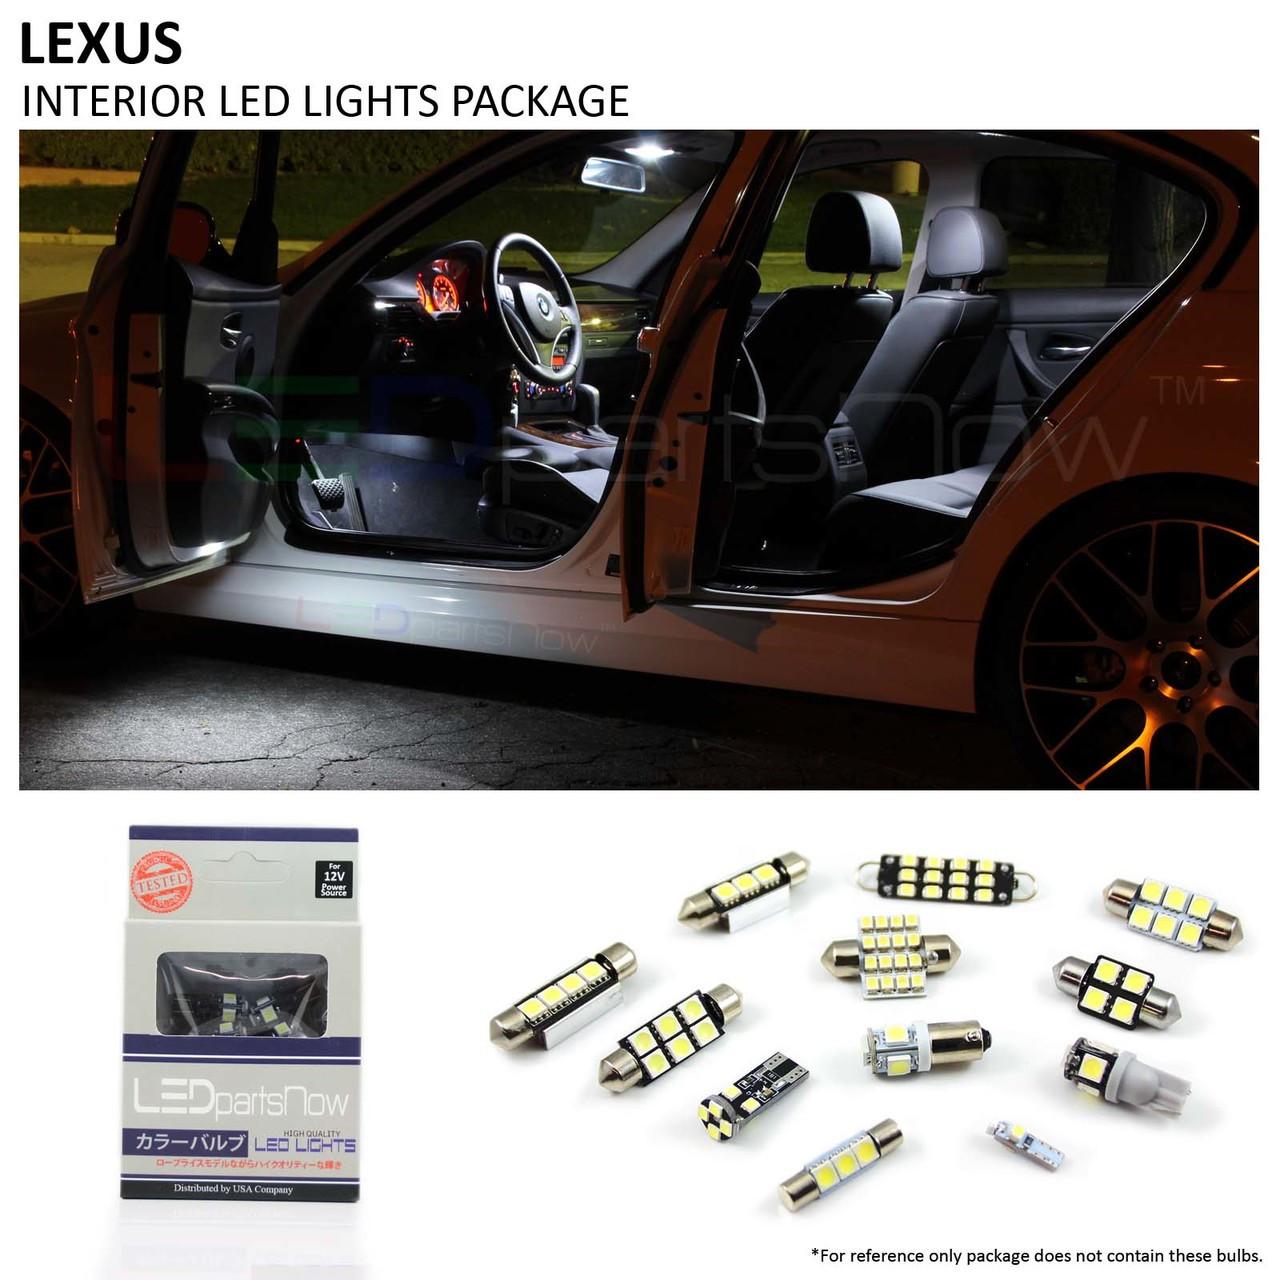 medium resolution of 2010 2015 lexus rx interior led lights package image 1 lexus rx 450h wiring diagram